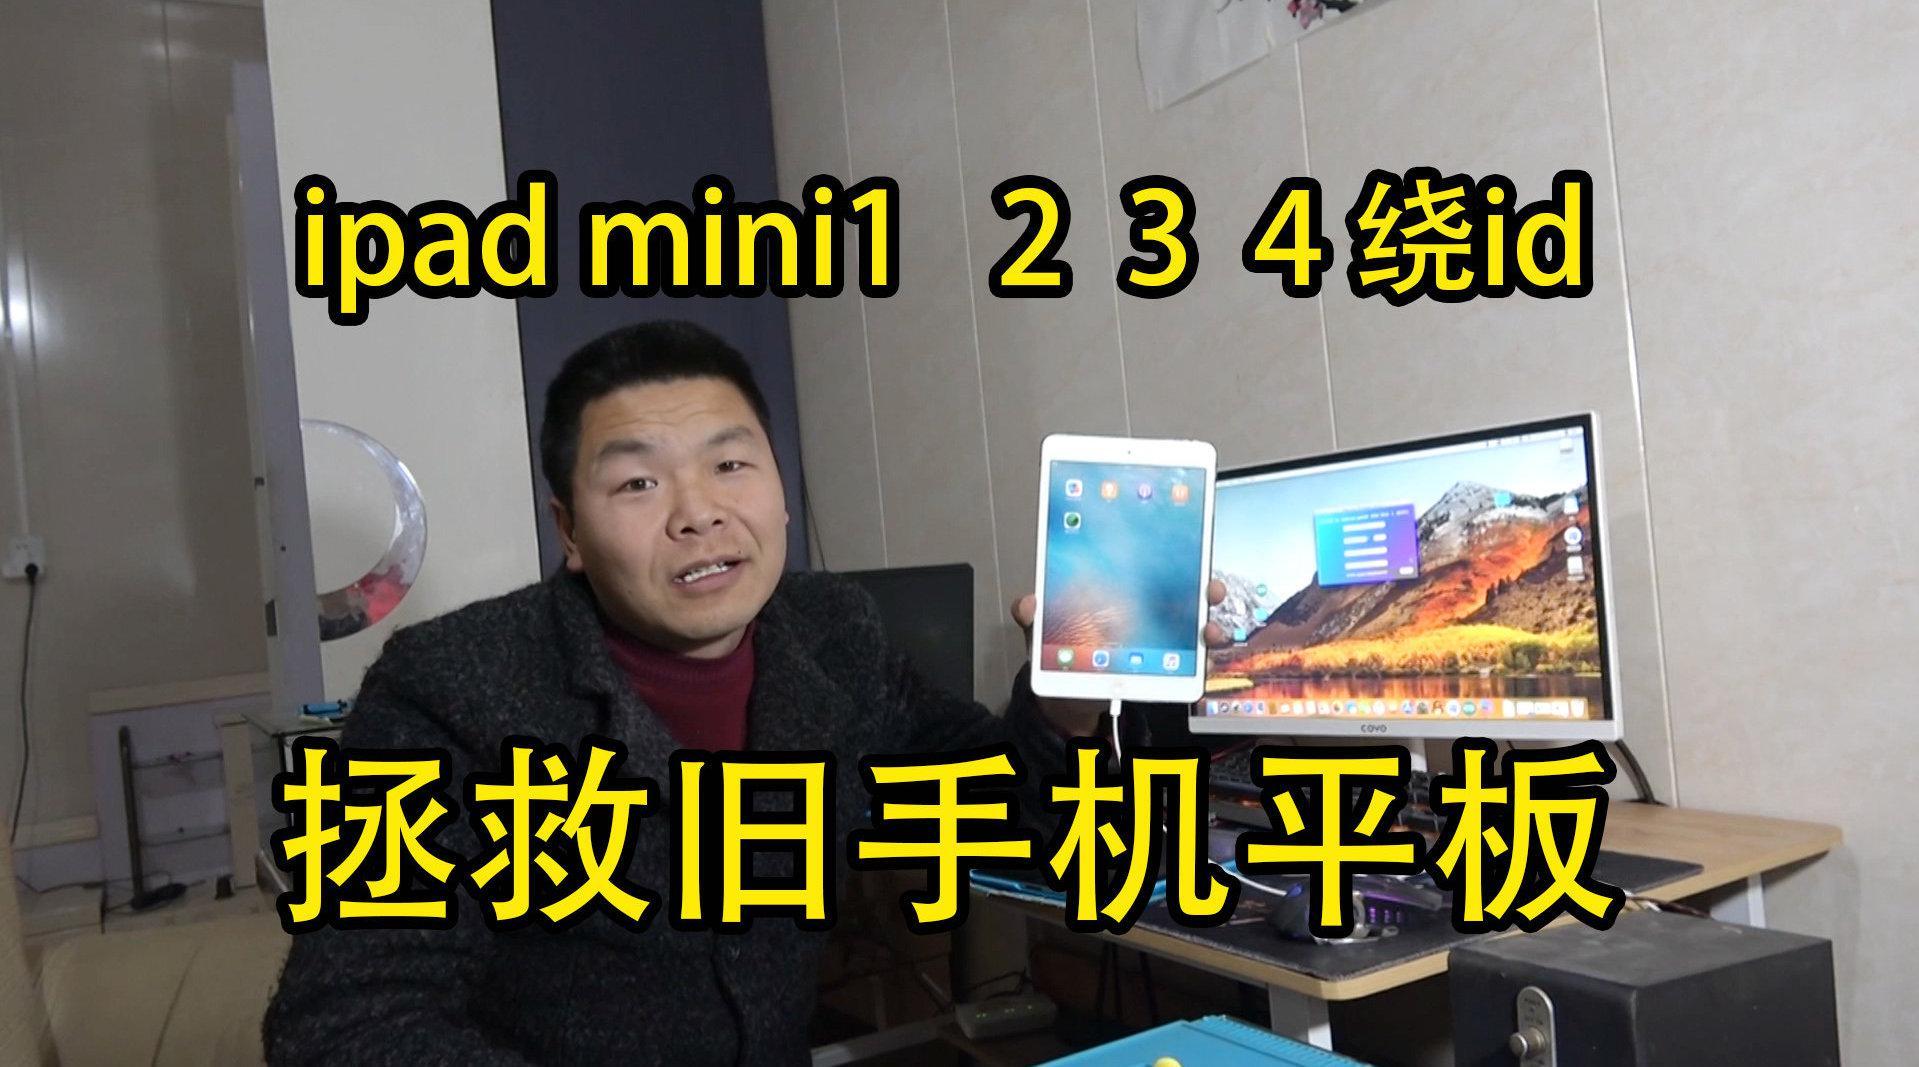 ipad mini1绕ID激活锁,让苹果老平板和手机焕然一新